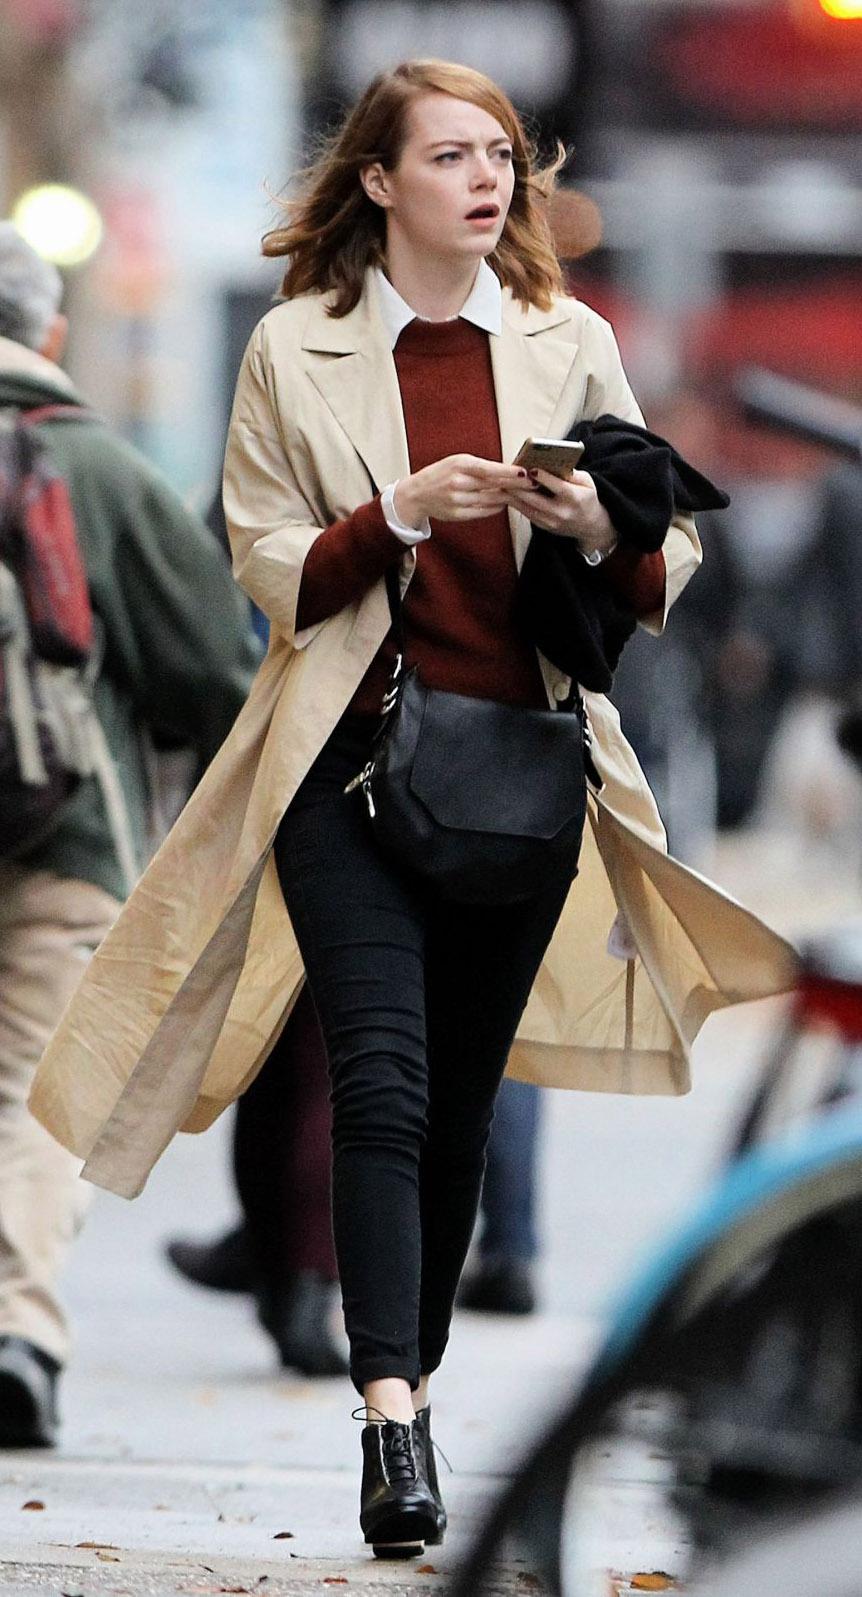 black-skinny-jeans-white-collared-shirt-r-burgundy-sweater-tan-jacket-coat-trench-fall-winter-black-shoe-booties-black-bag-emmastone-celebrity-newyork-hairr-lunch.jpg